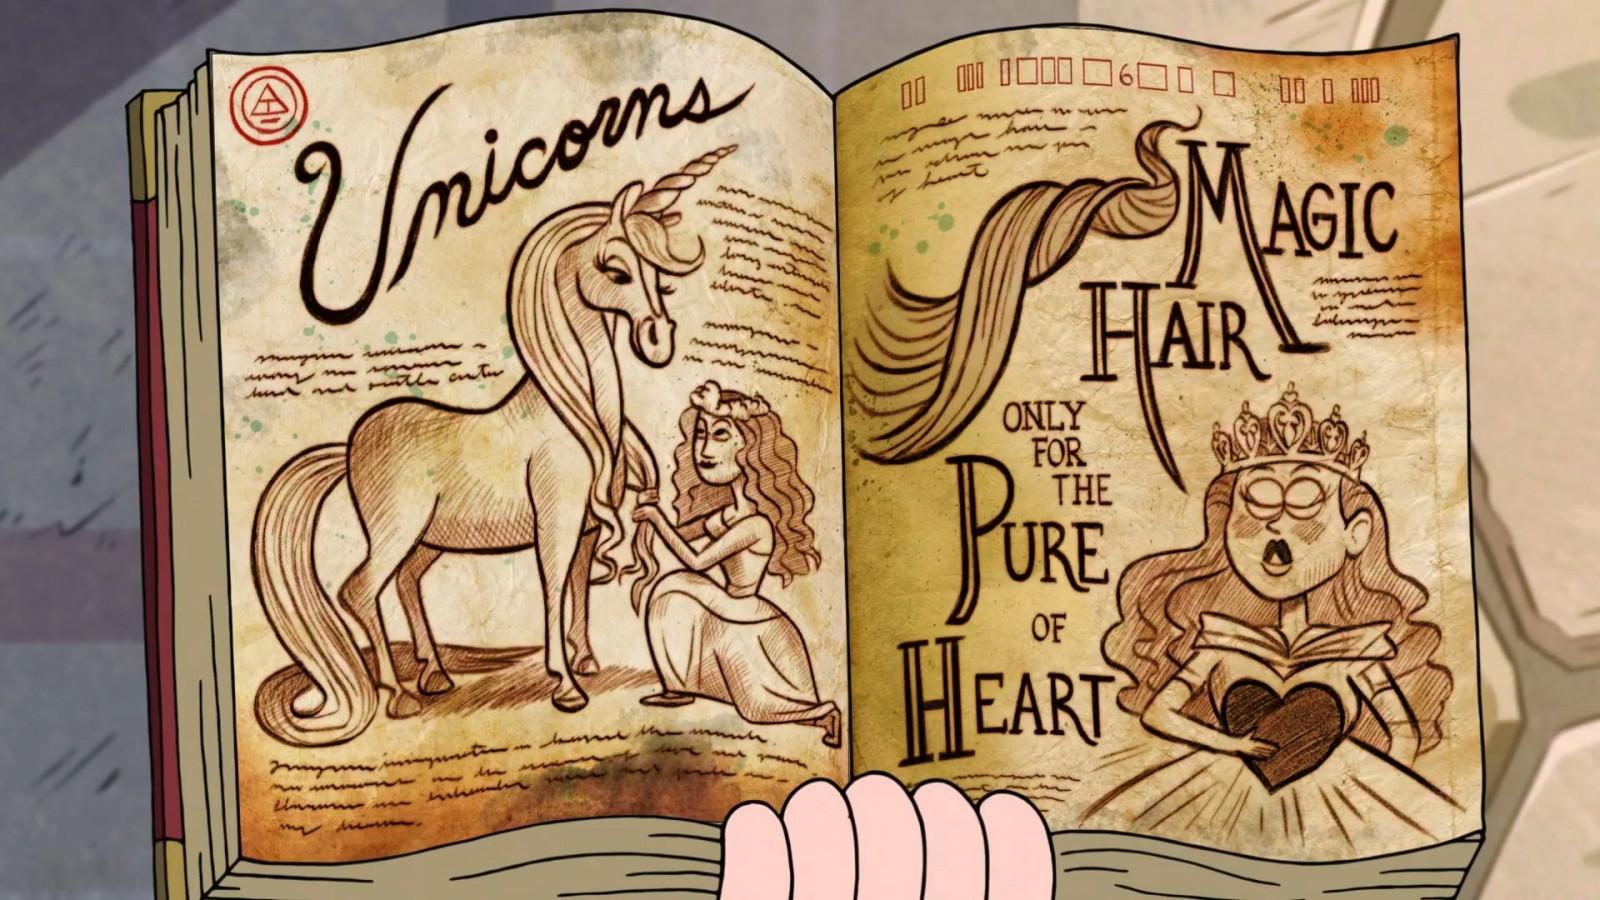 Wallpaper Ilustrasi Gambar Kartun Unicorn Gravity Falls Seni